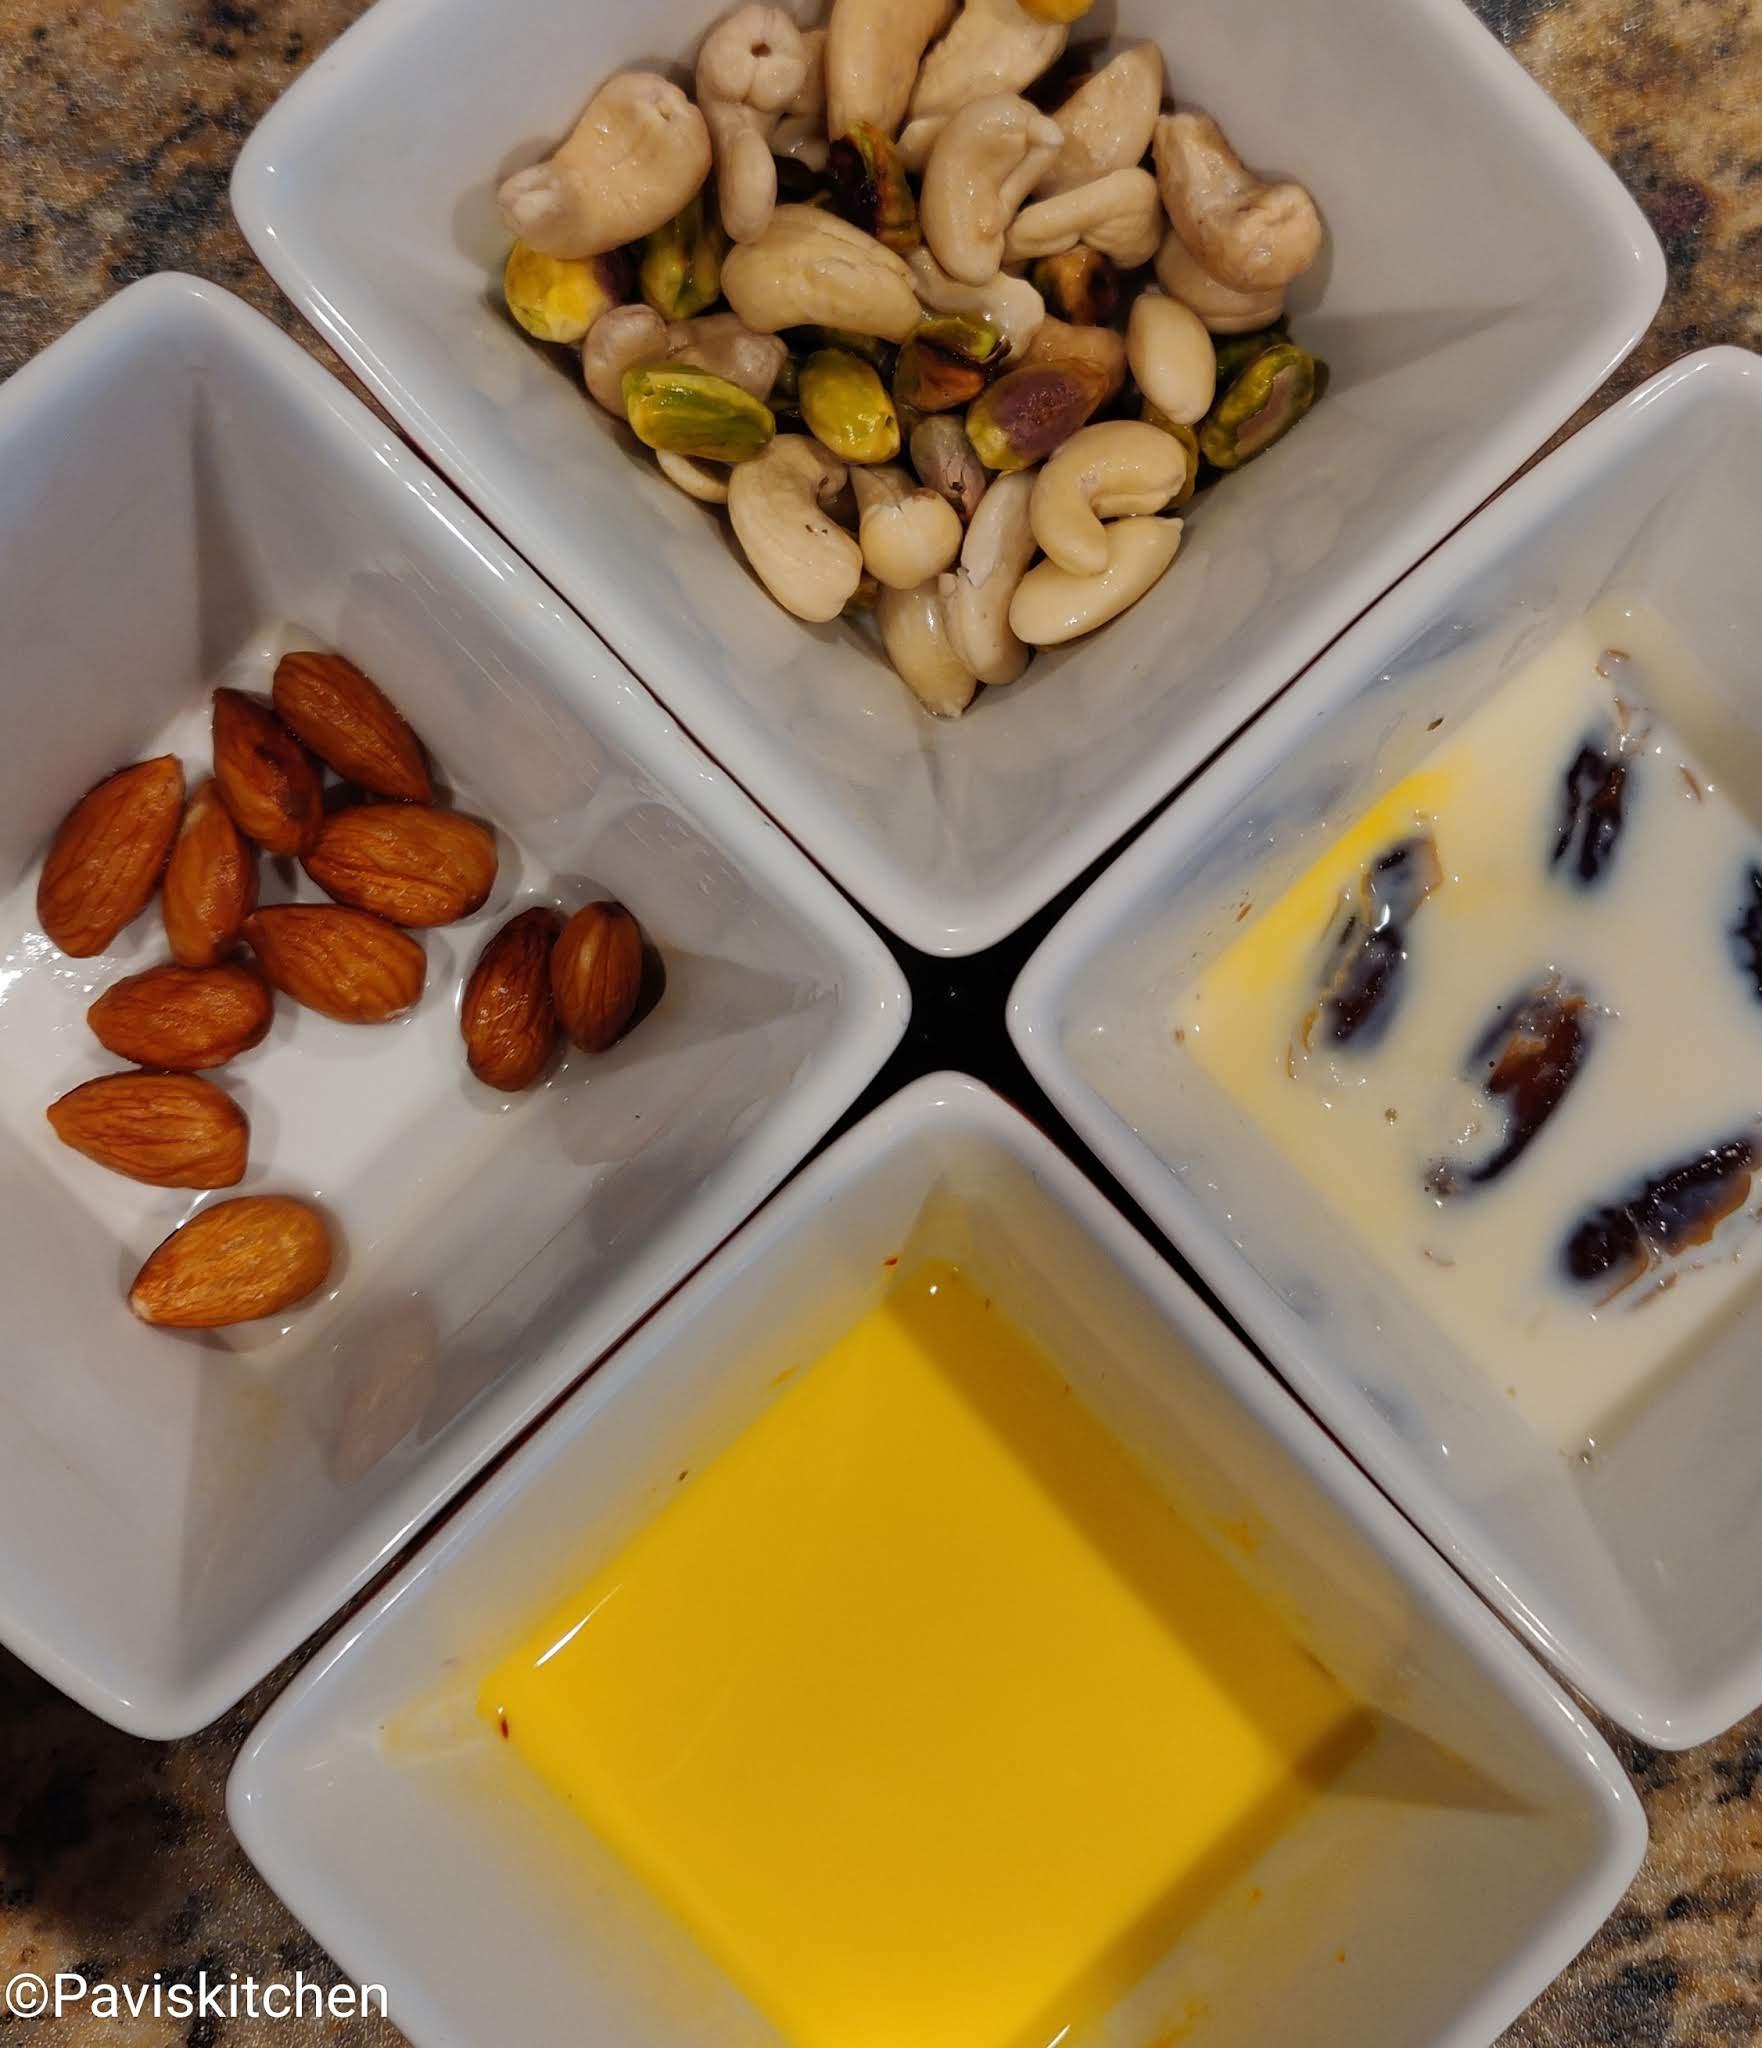 Dry fruits milkshake recipe | how to make dry fruit milkshake | Indian dry fruit smoothie recipe